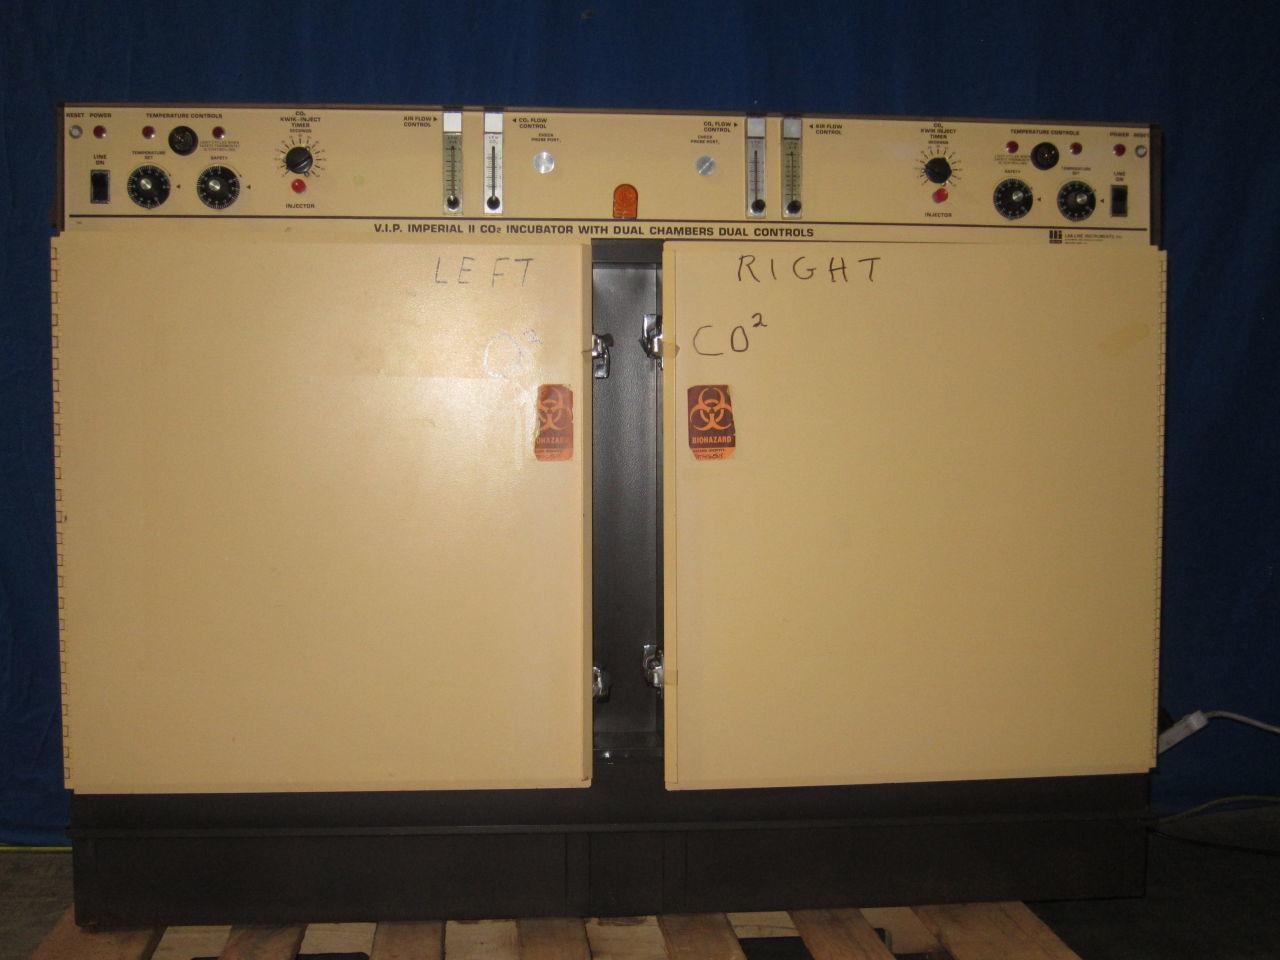 LAB-LINE INSTRUMENTS 425 Incubator